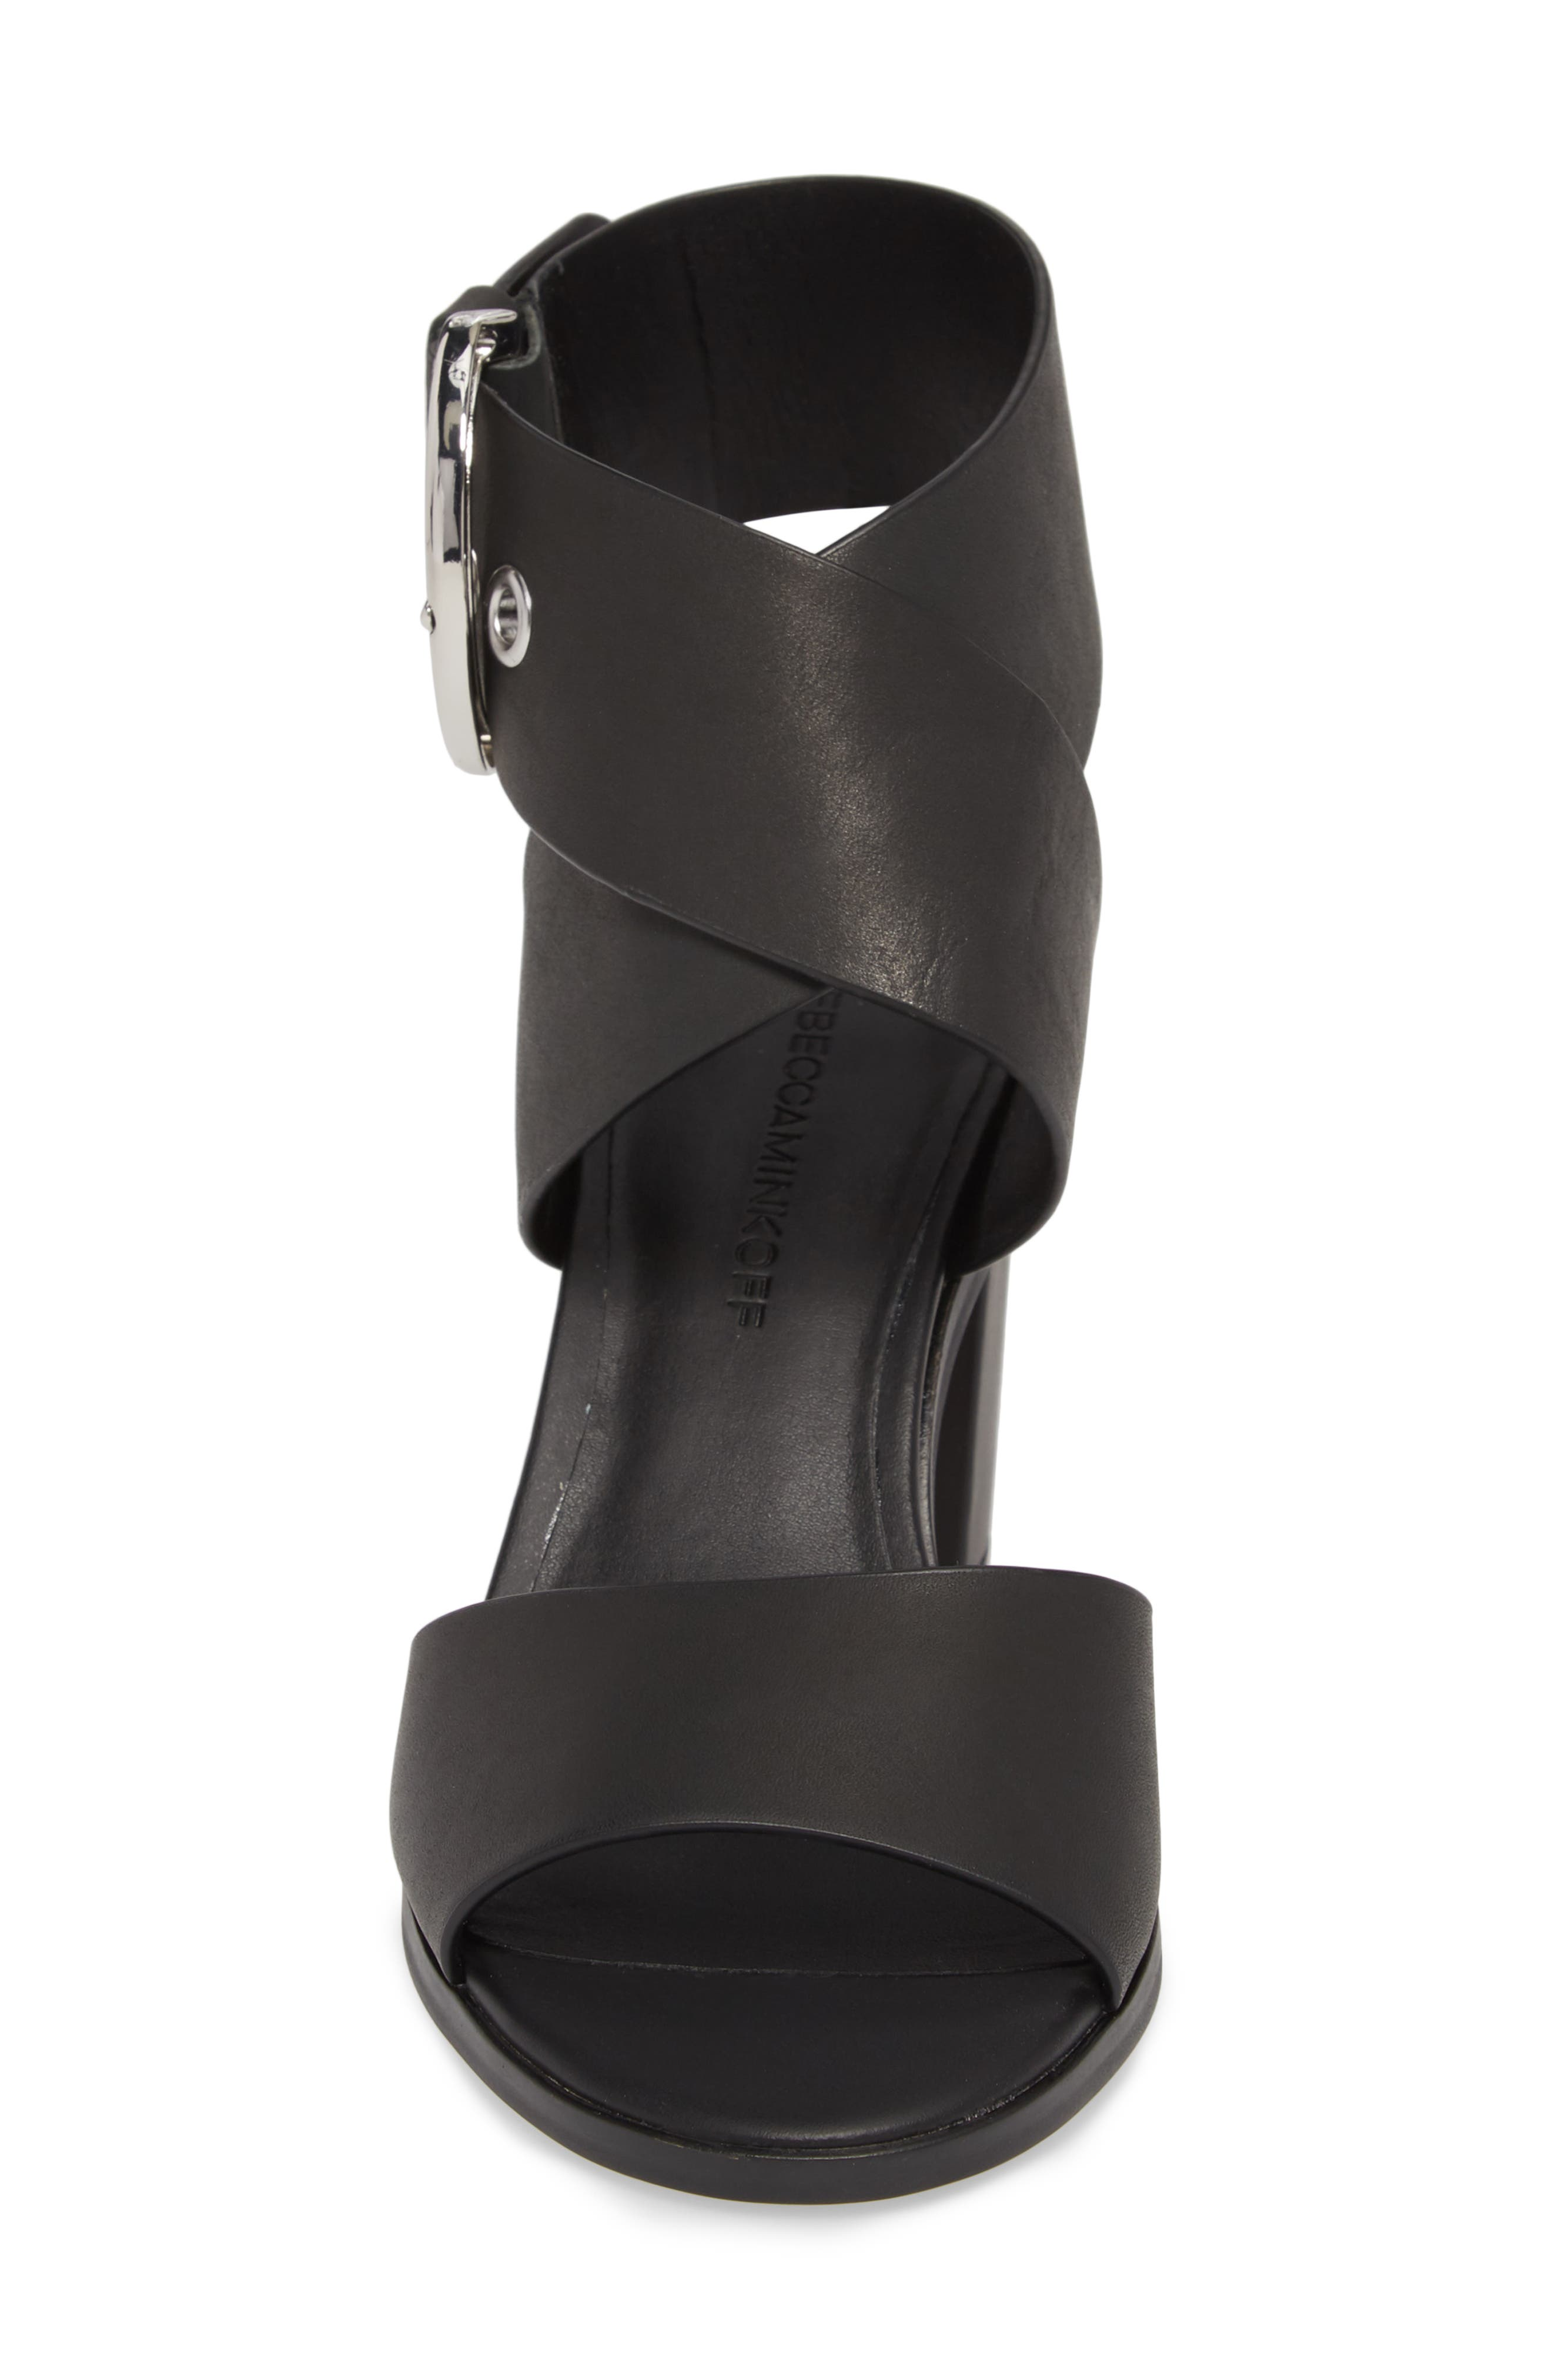 Valaree Sandal,                             Alternate thumbnail 4, color,                             Black Leather